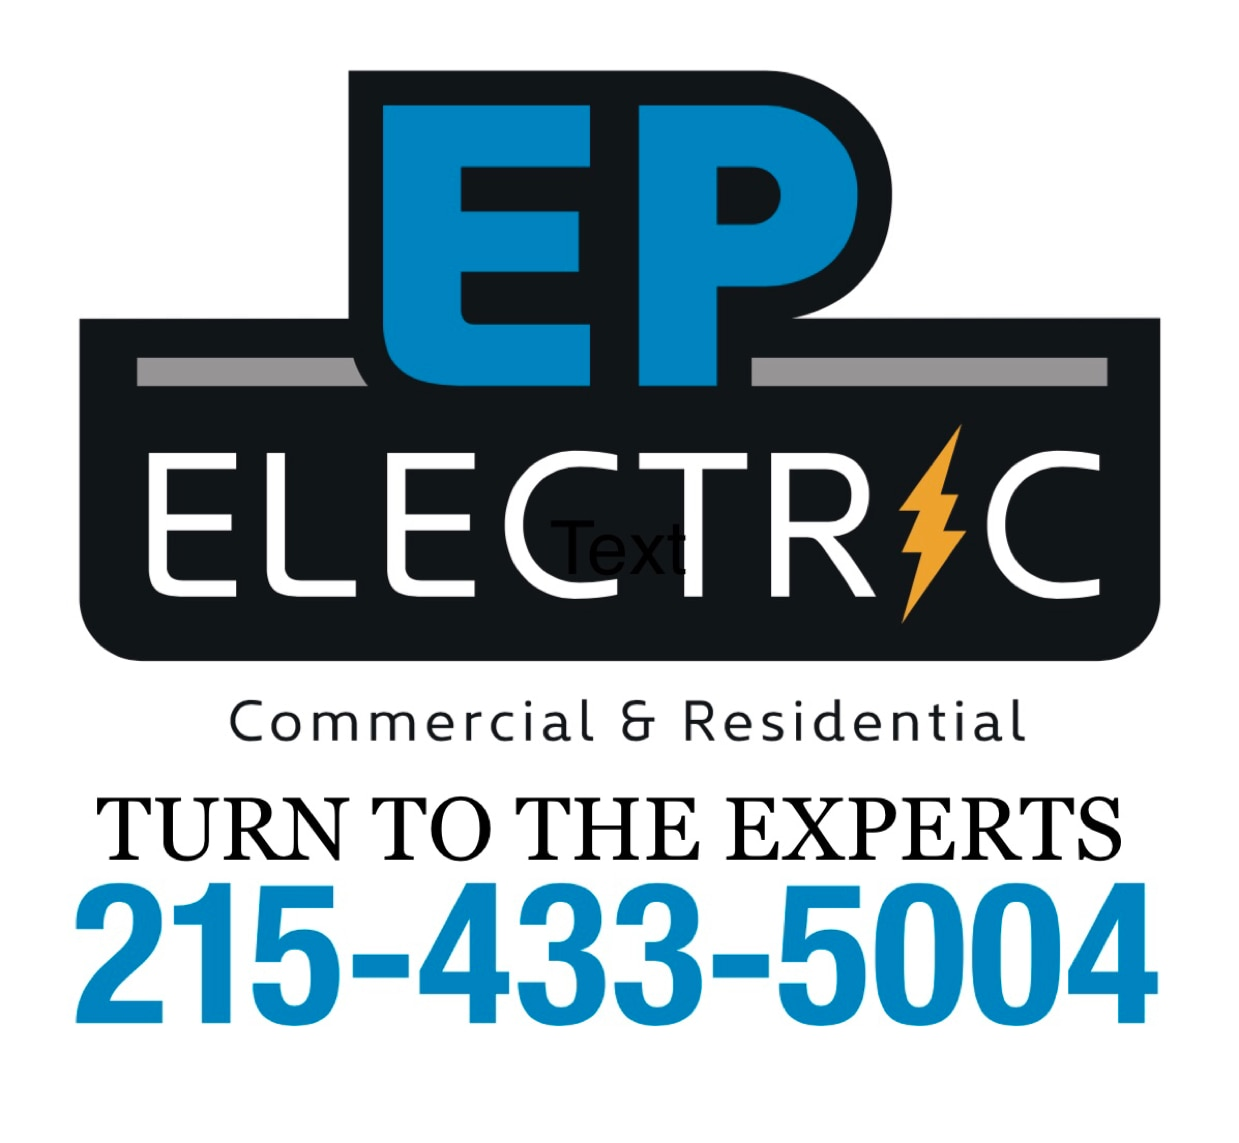 EP Electric logo